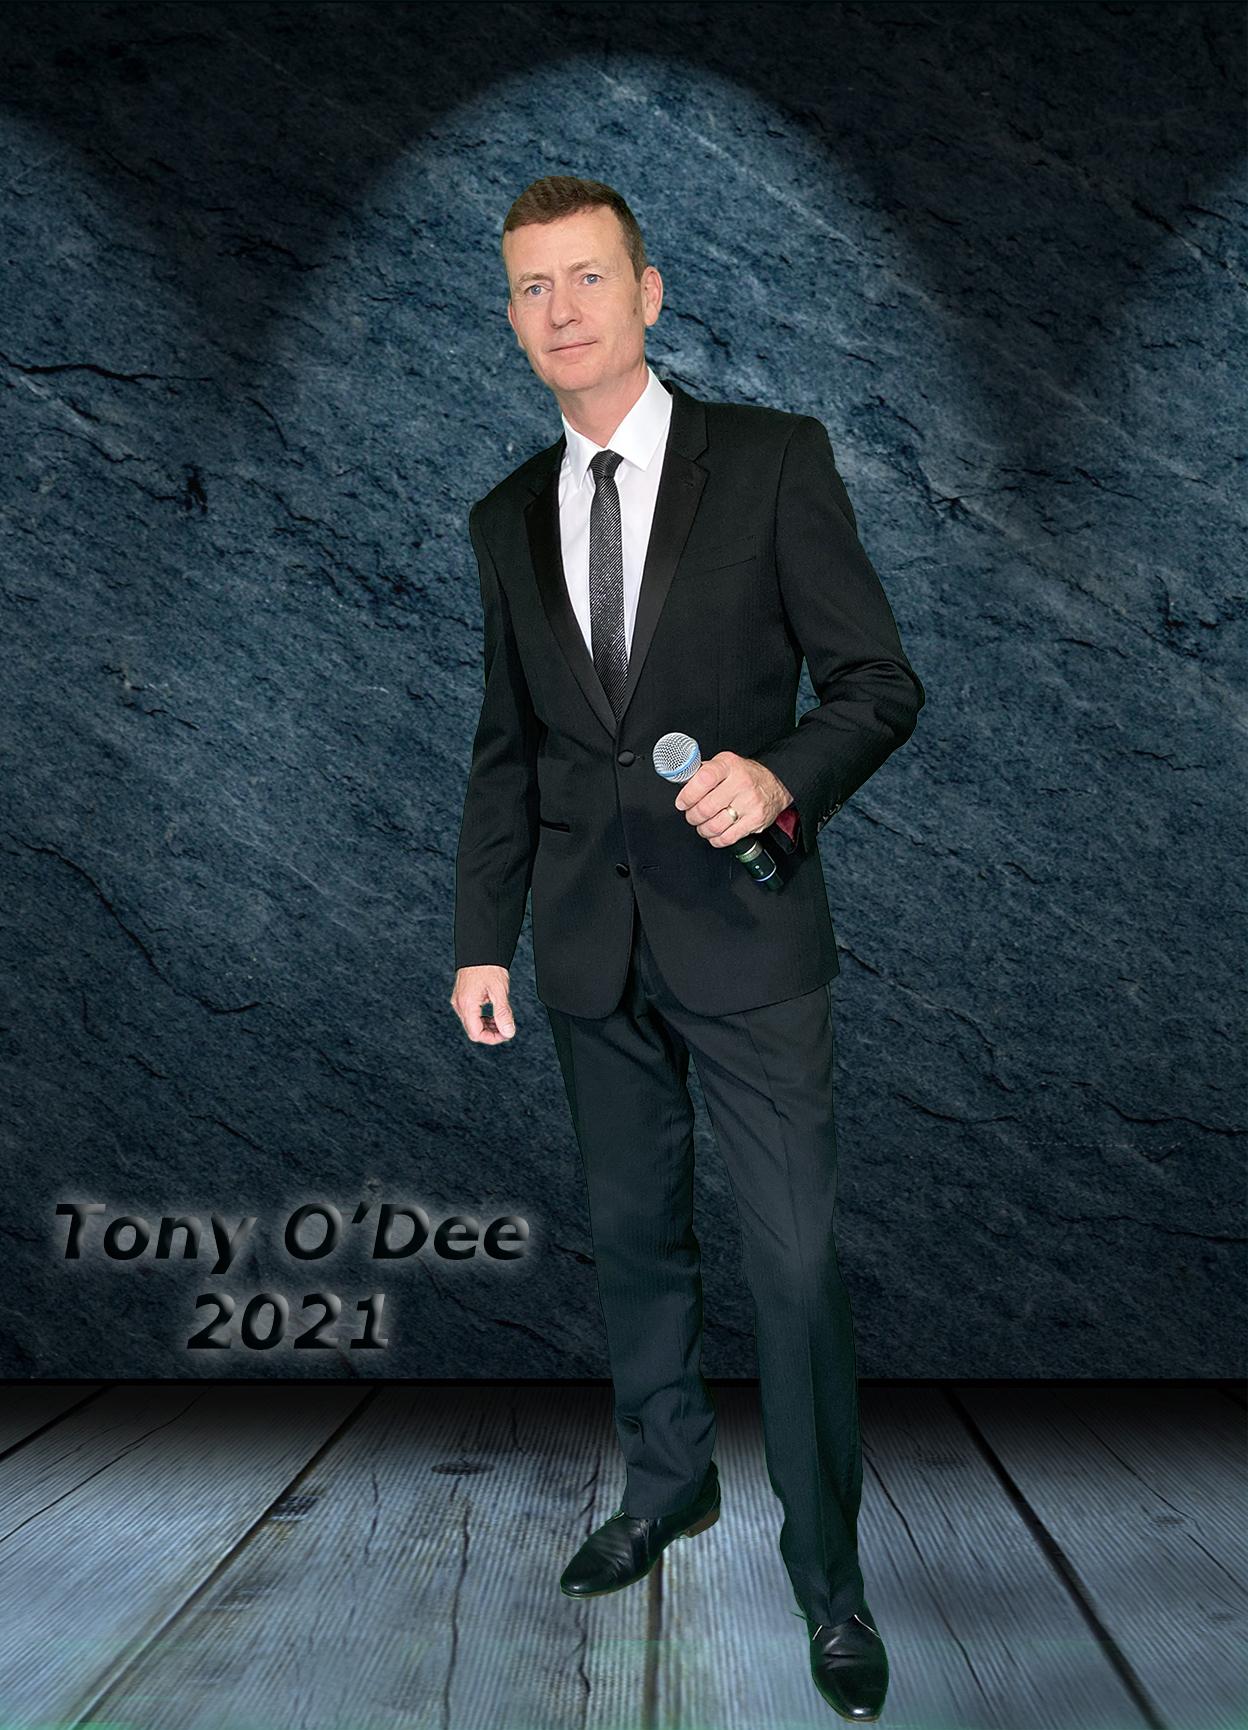 4 Suit Tie